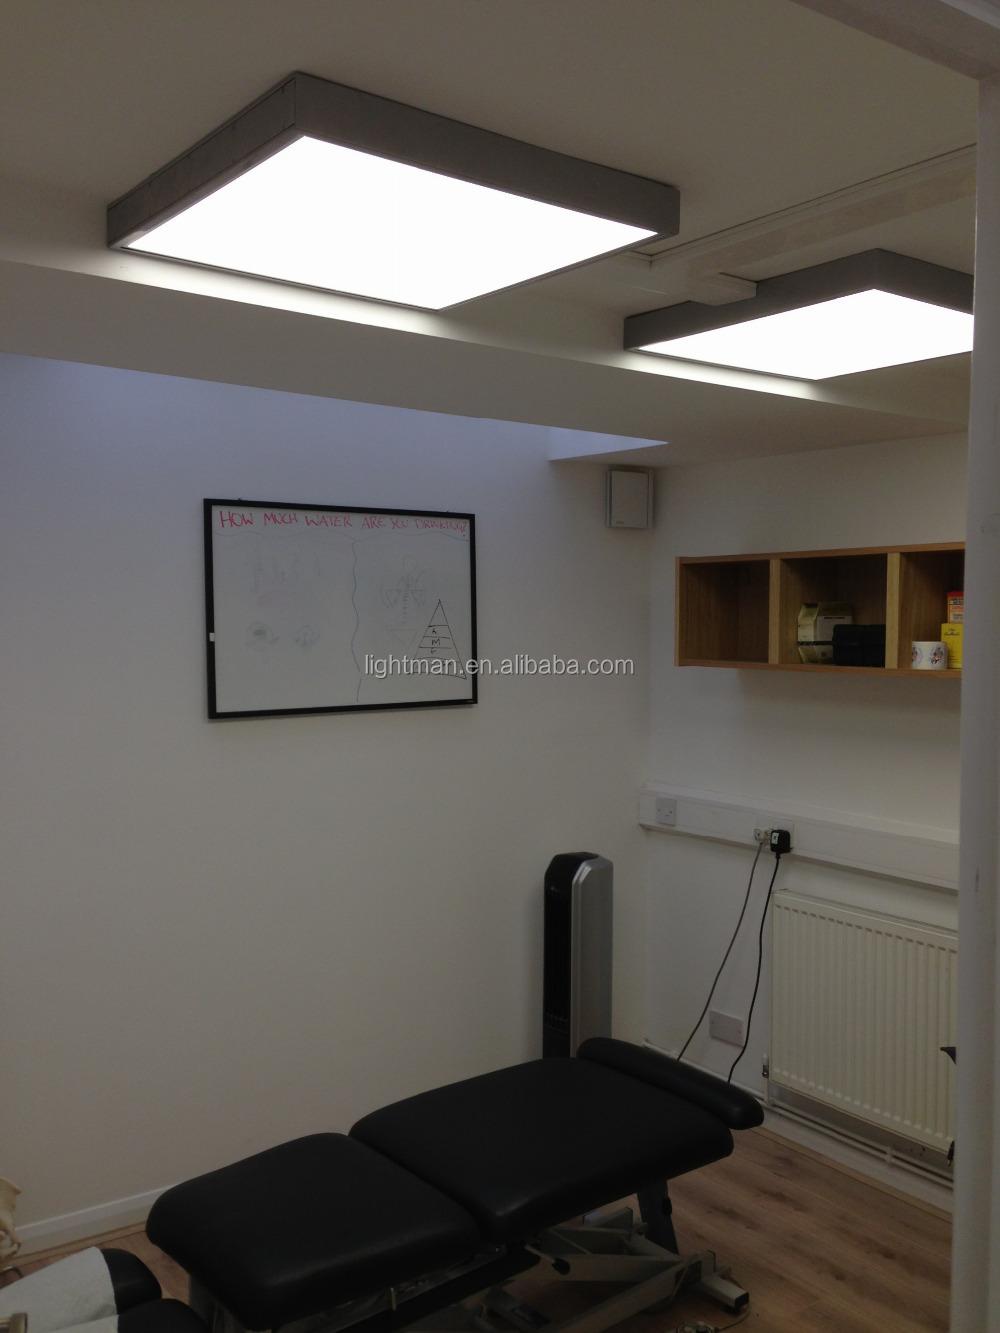 Wholesale Stocked in UK 300x300 LED Panel Mount Frame Kit in ...